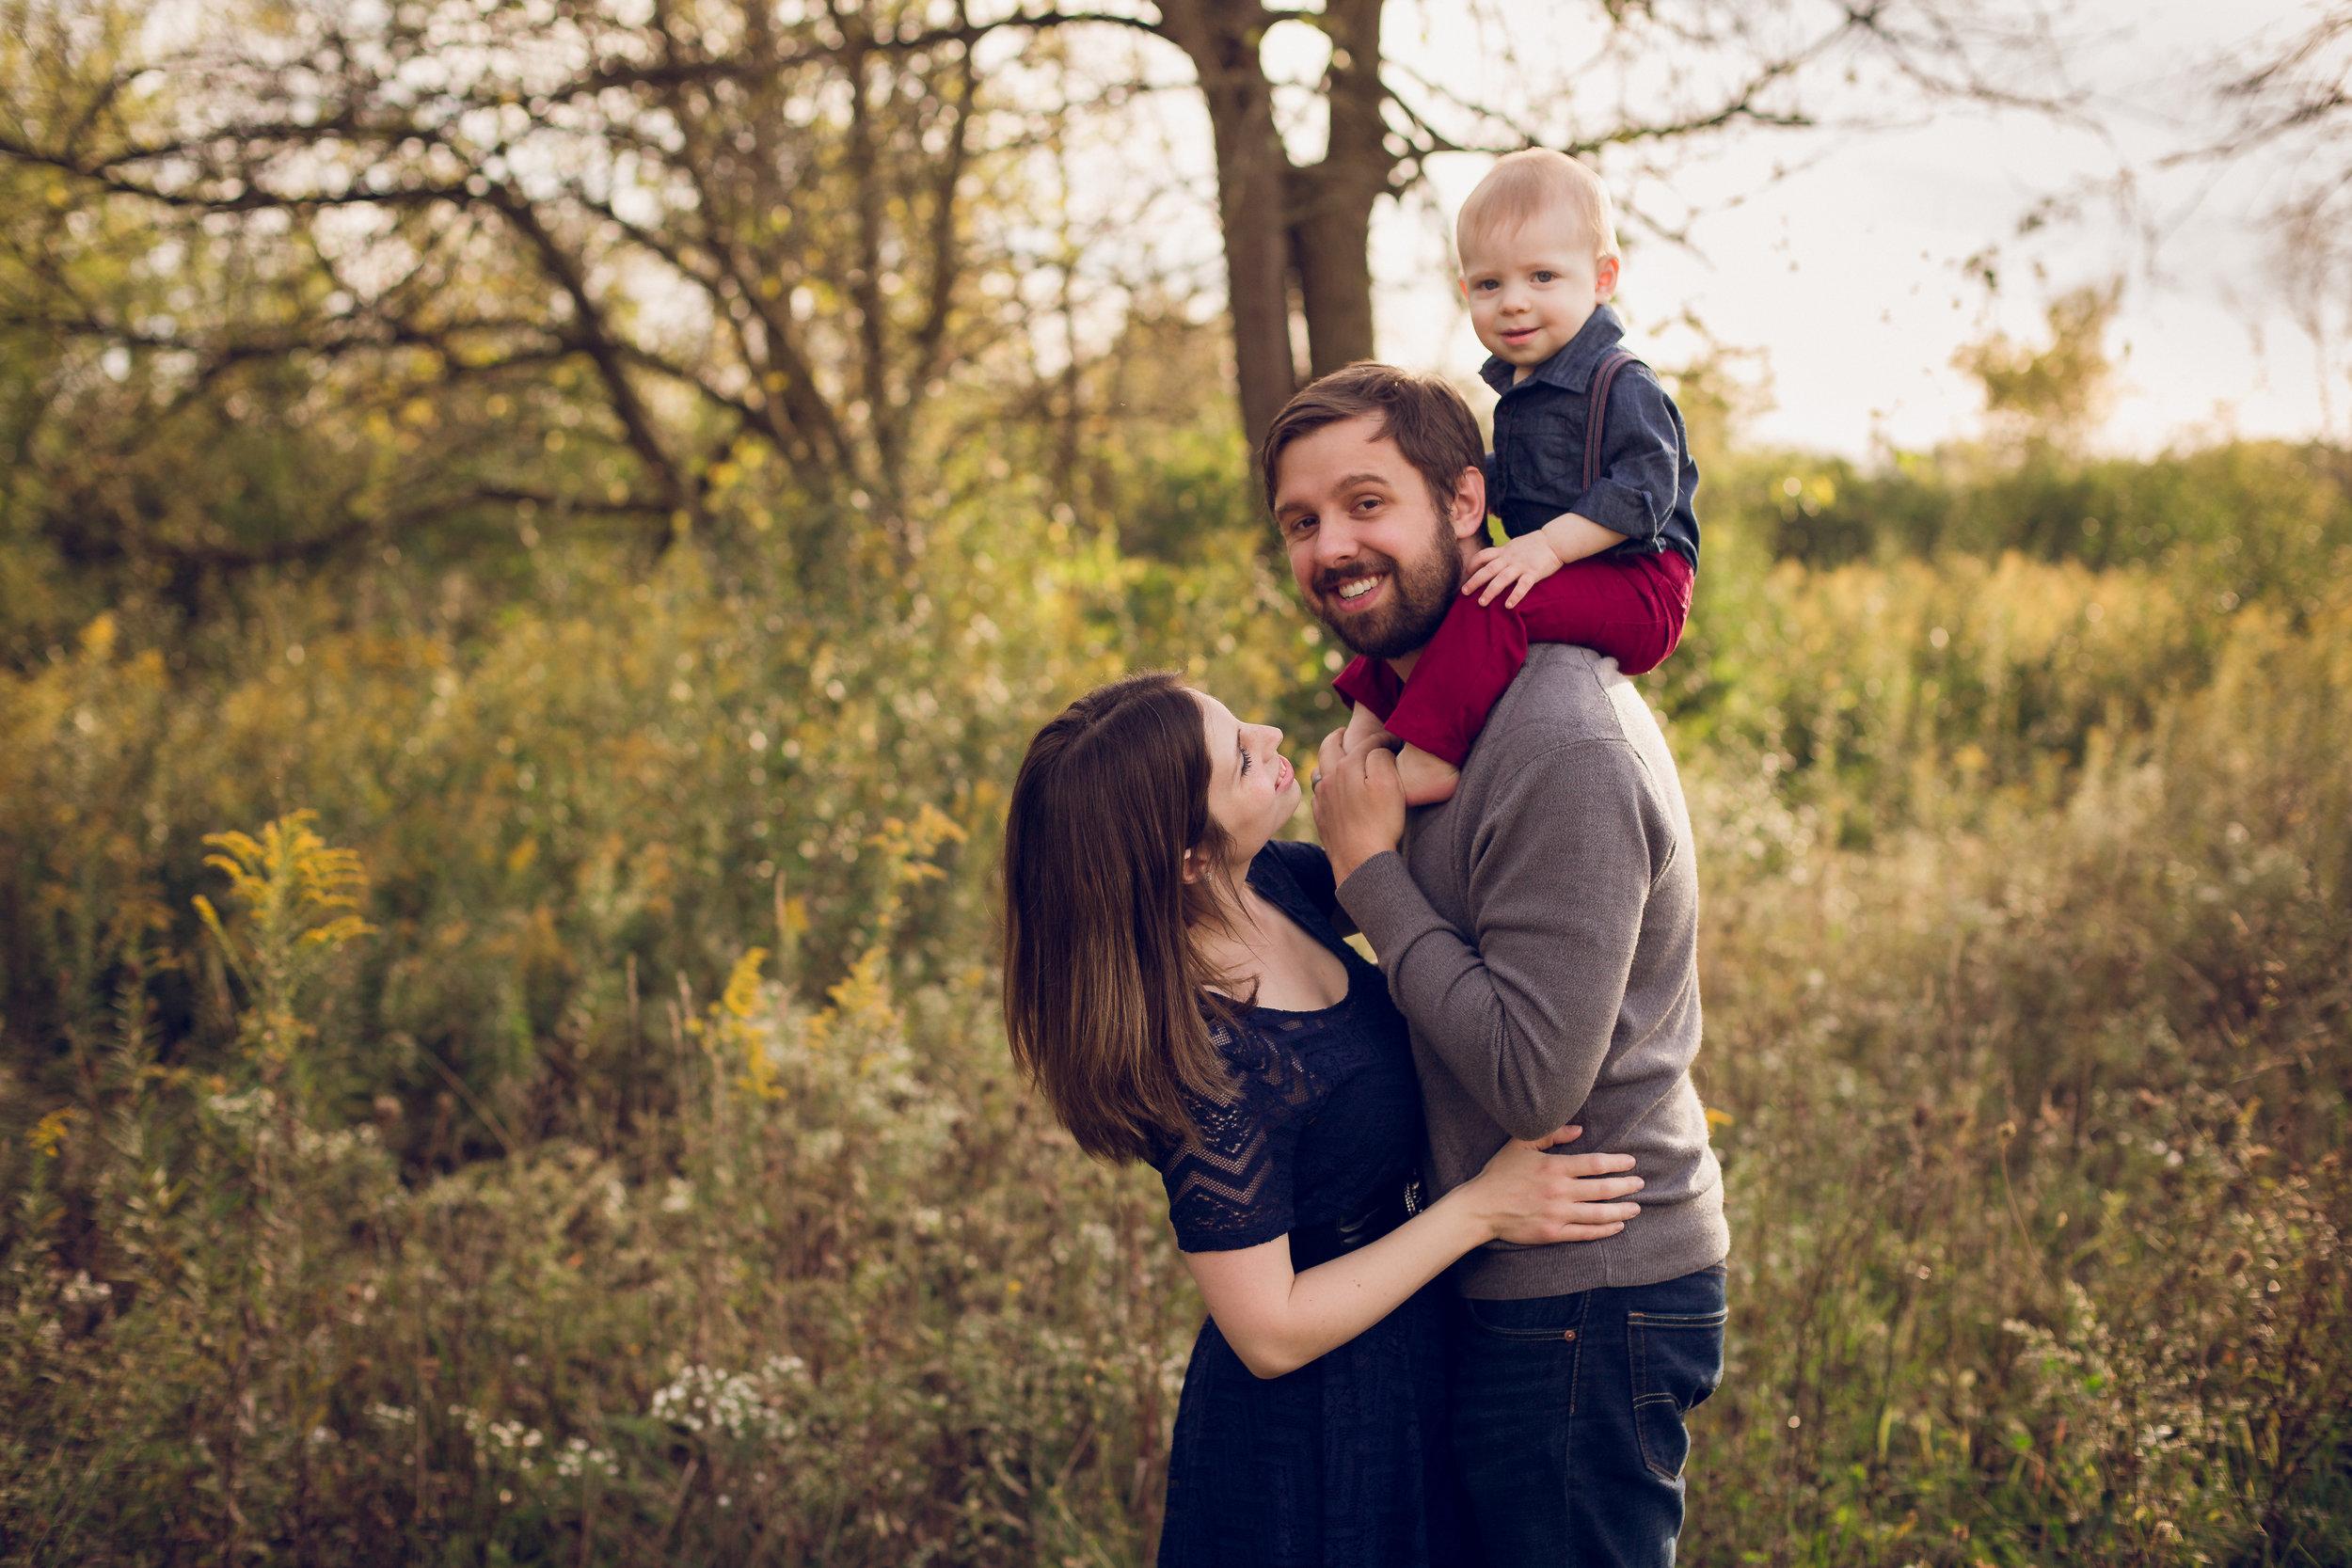 family-photo-session-at-scioto-grove-metro-park-grove-city.jpg